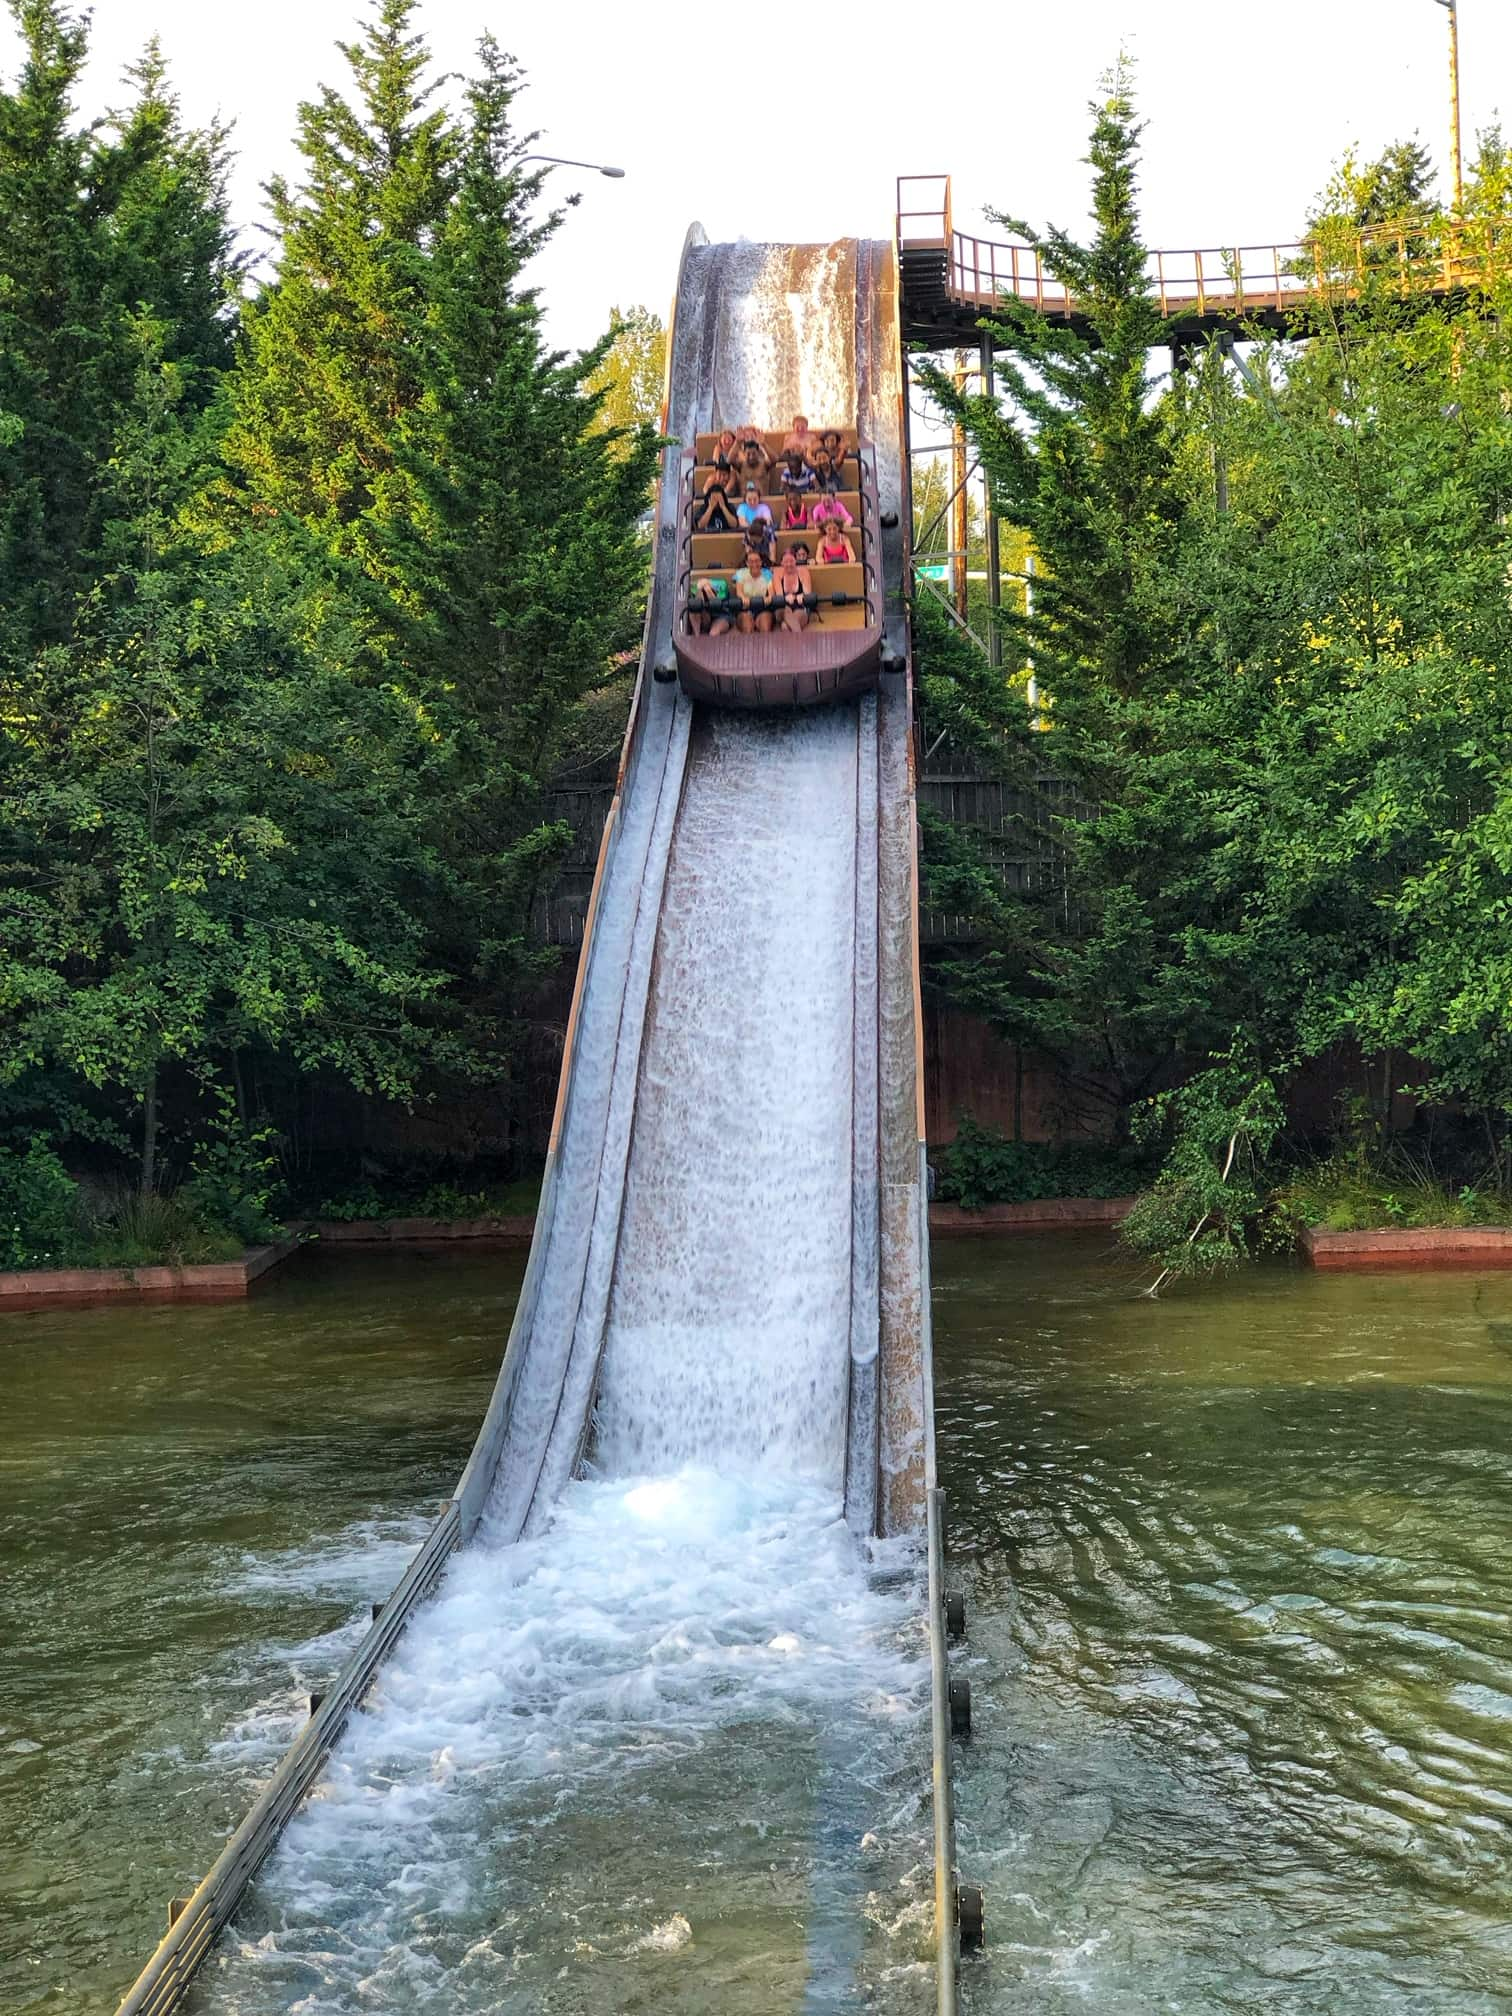 wild waves theme park rides